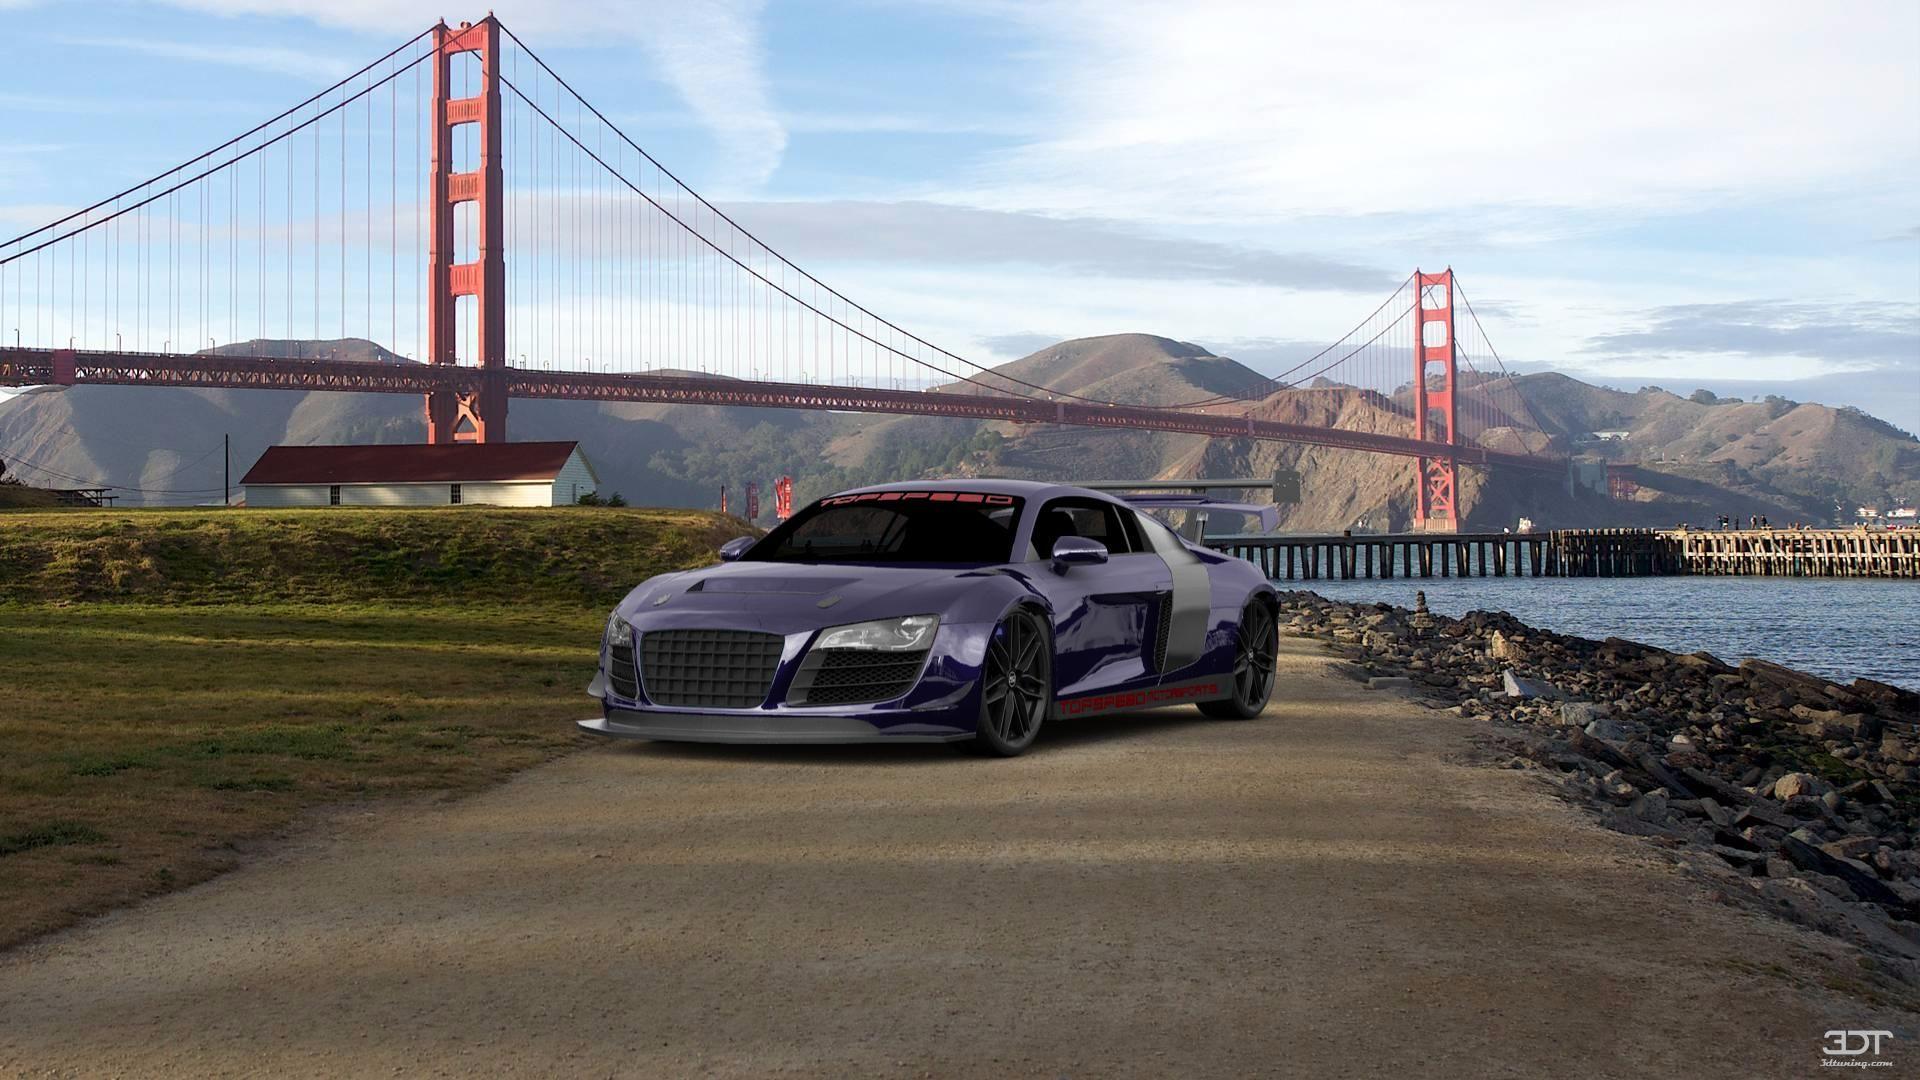 Checkout my tuning Audi R8 2107 at 3DTuning 3dtuning tuning